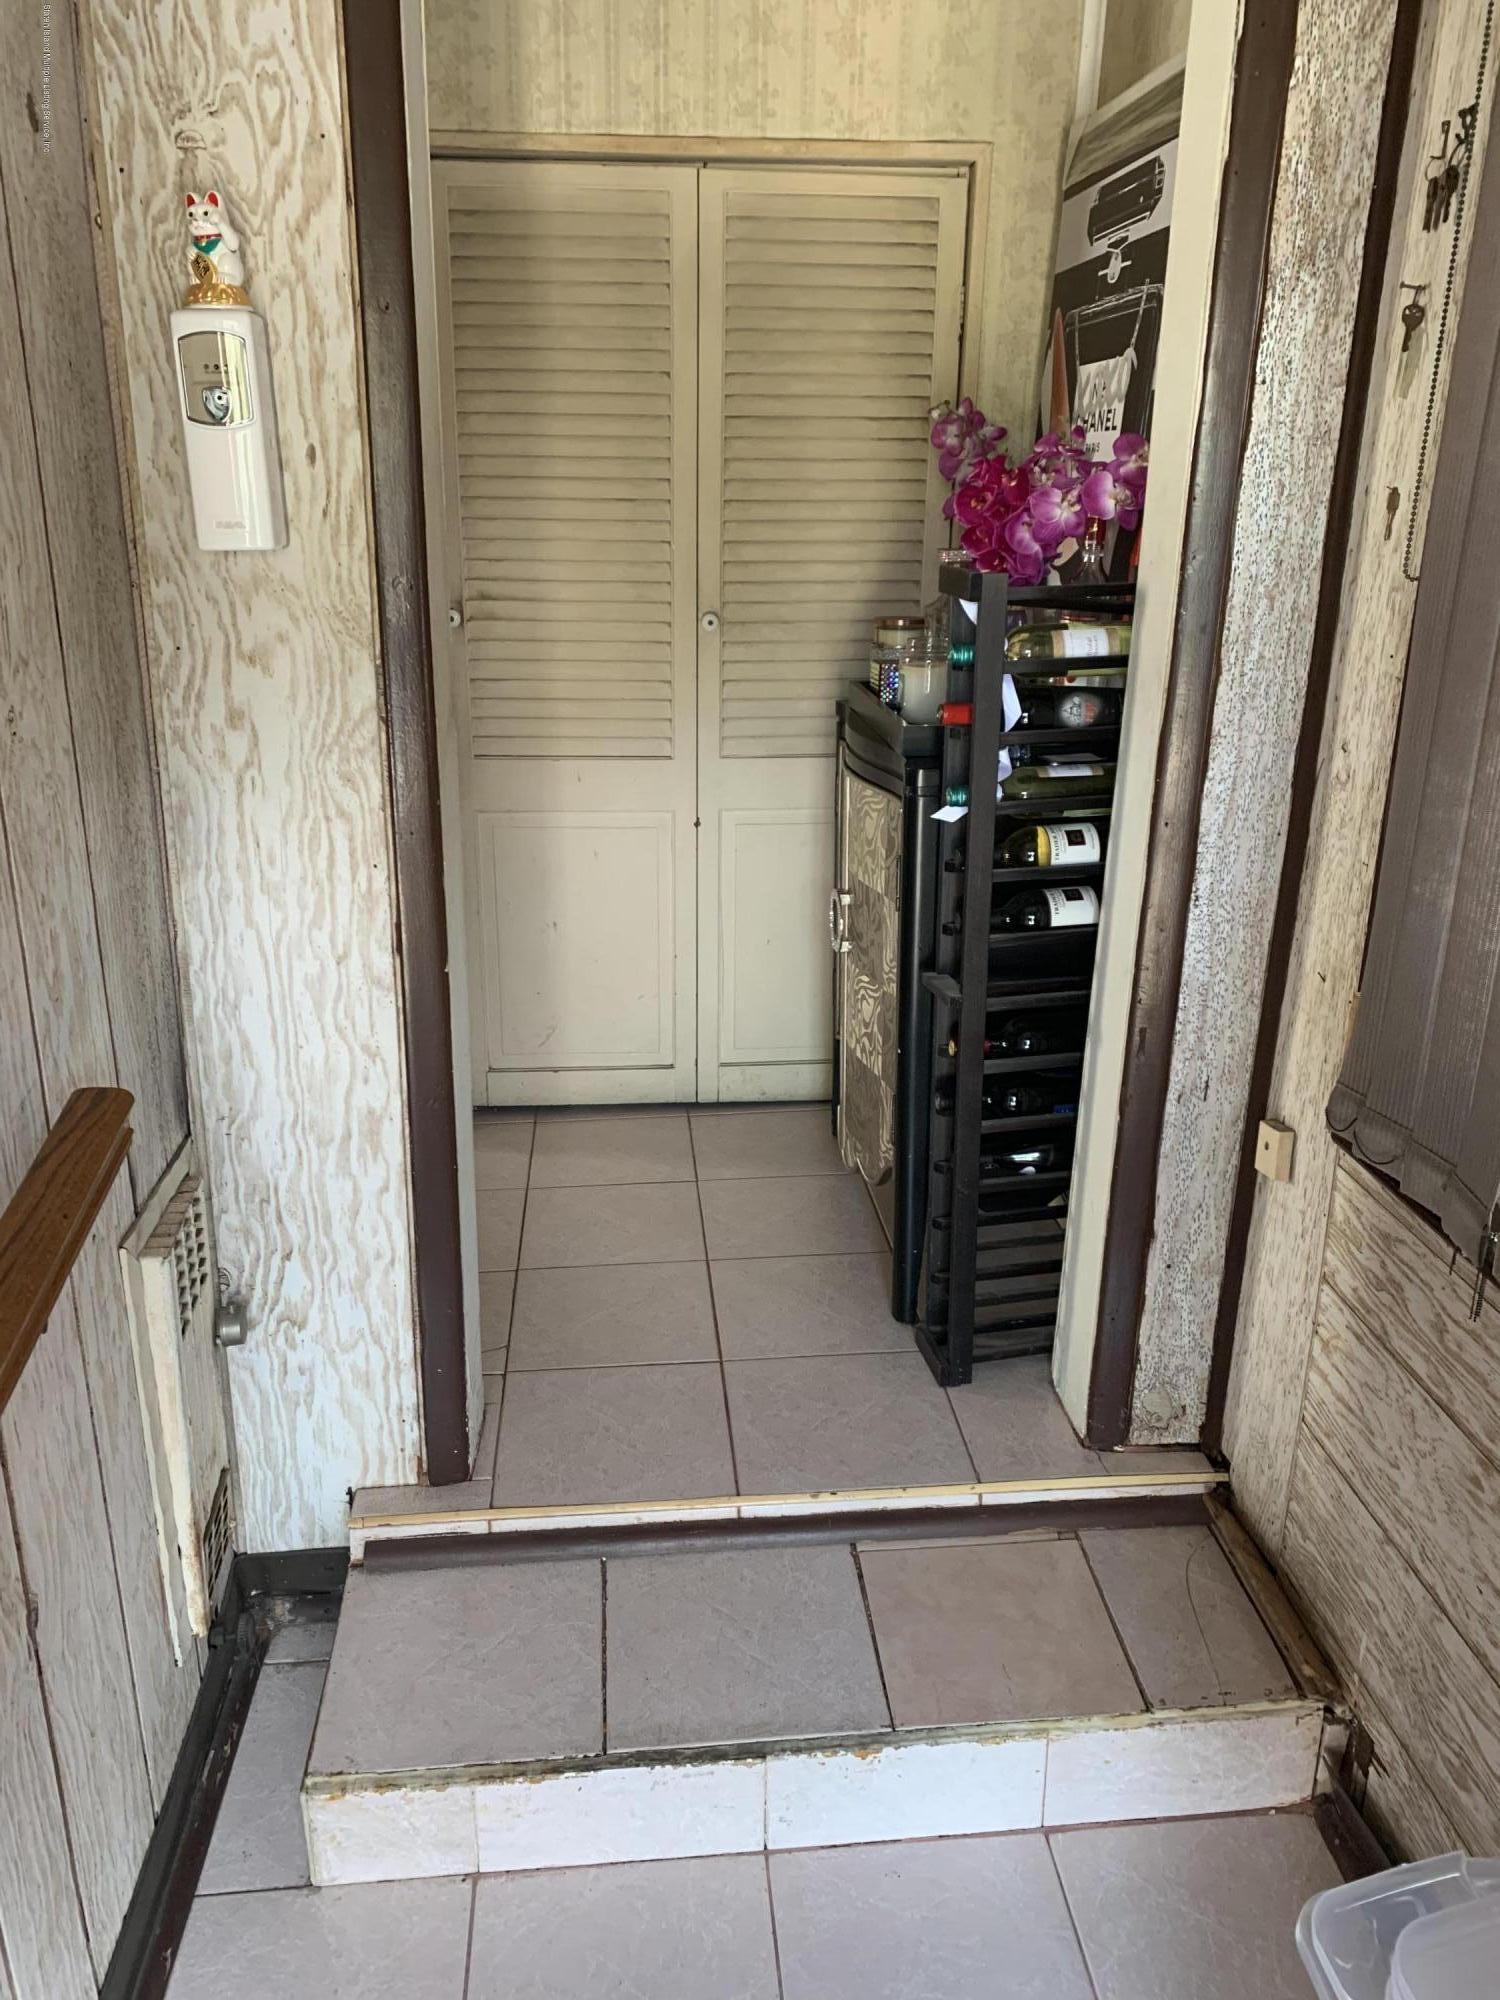 Two Family - Detached 2831 Batchelder Street  Brooklyn, NY 11235, MLS-1131584-2